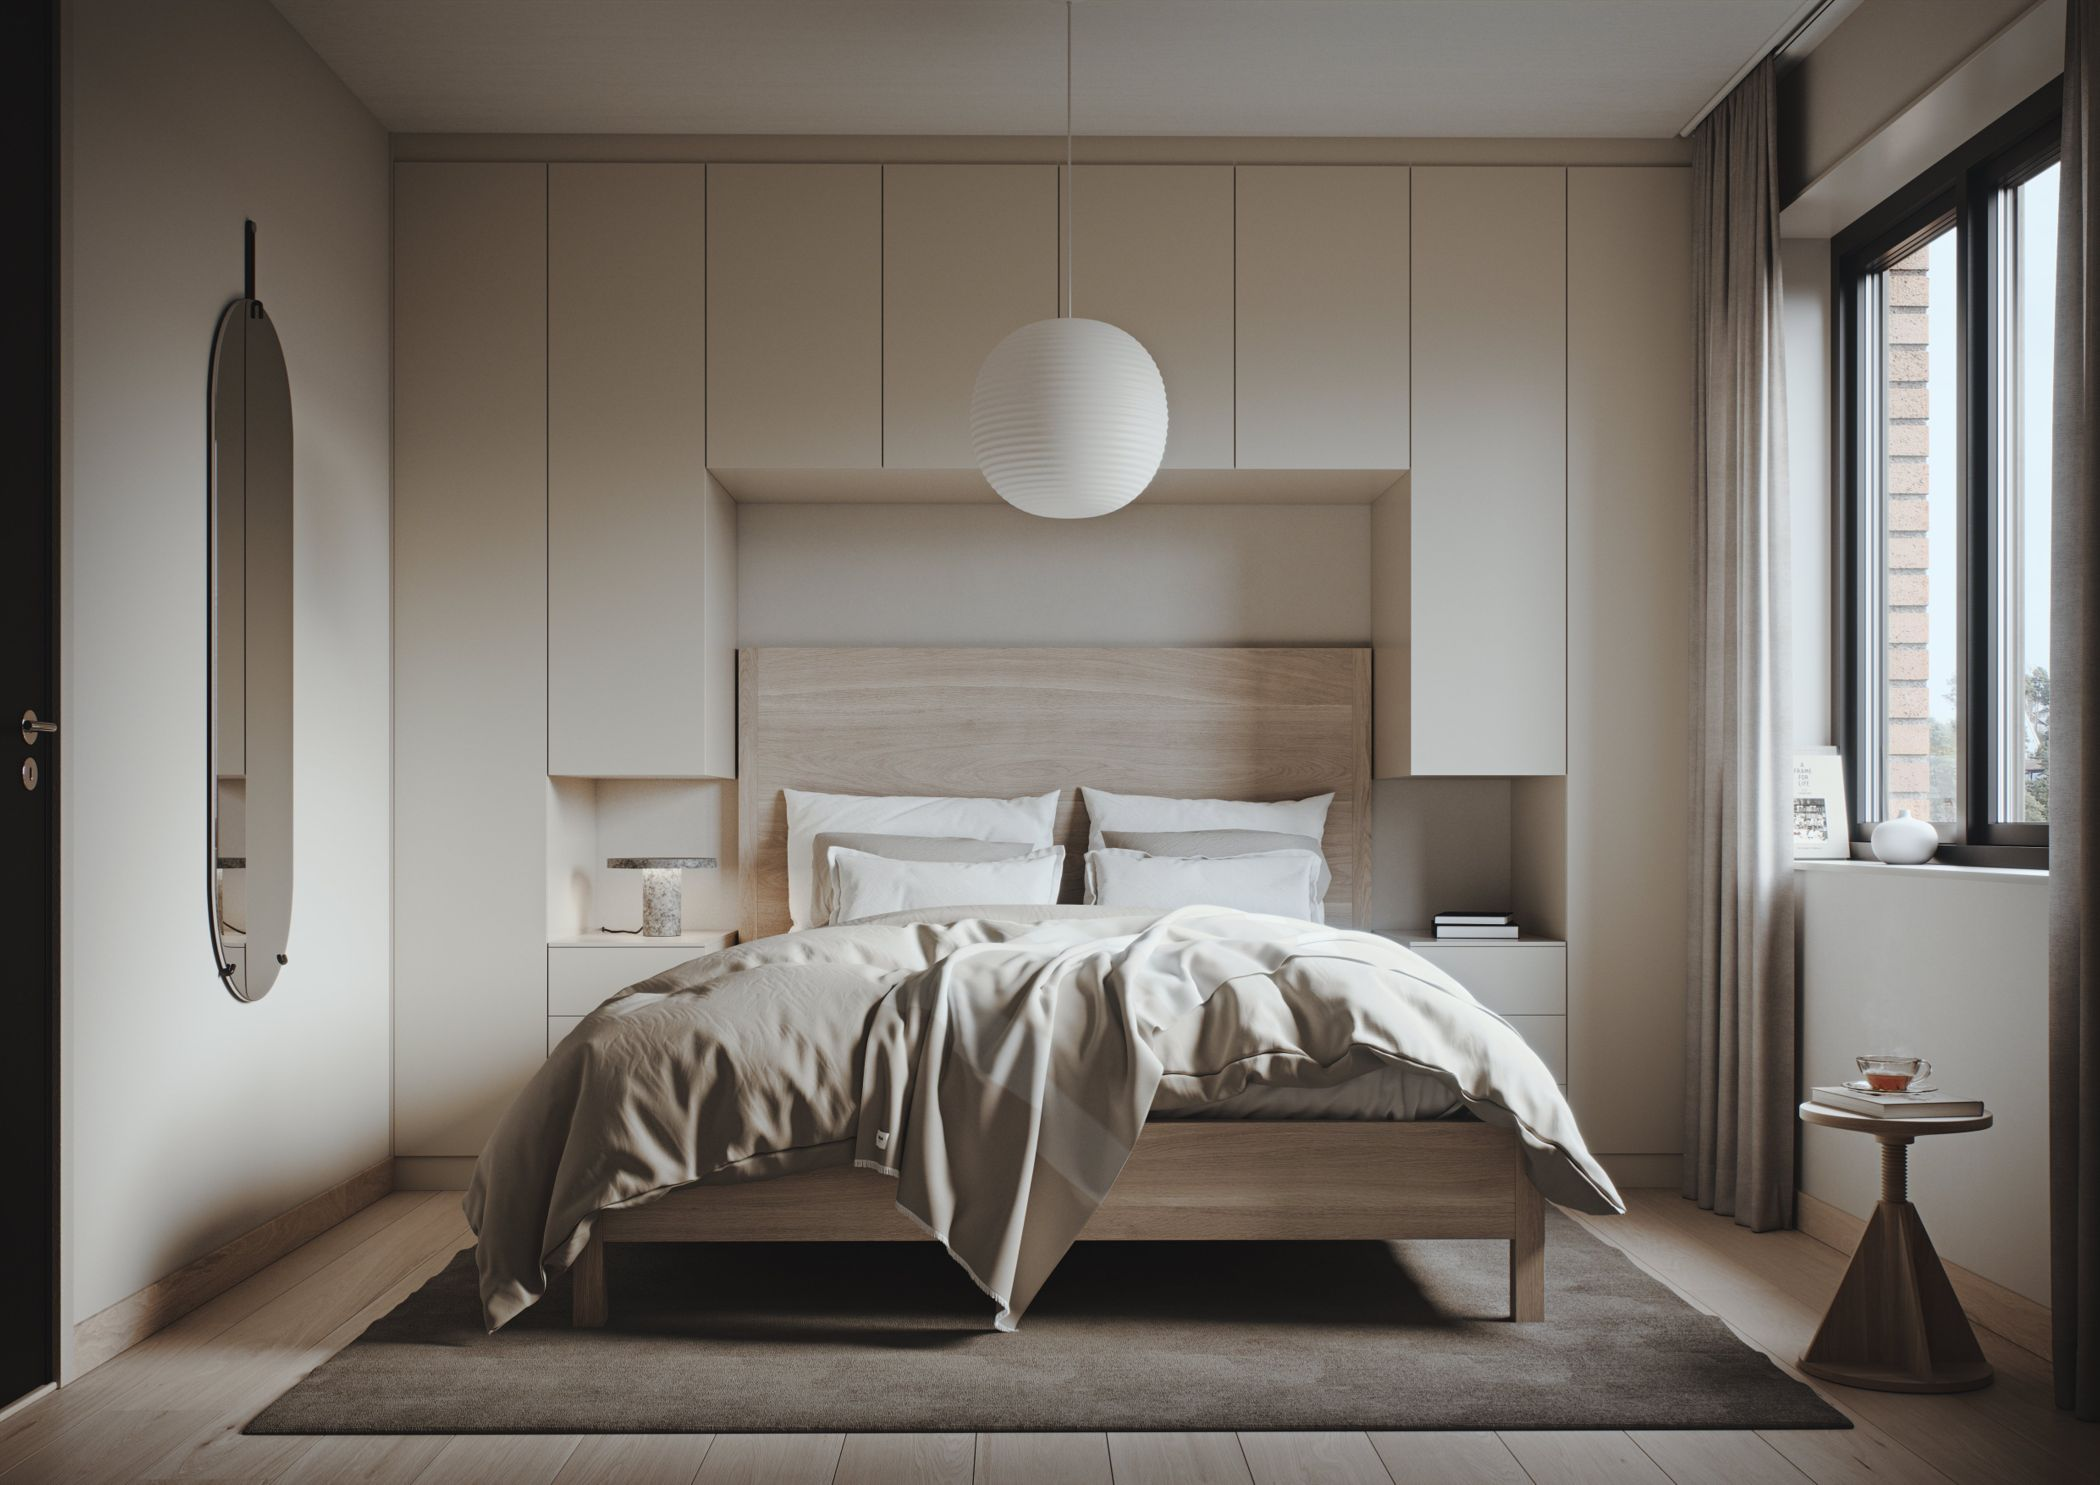 Arnljot_Gellines_vei_Bedroom_A1105.jpg